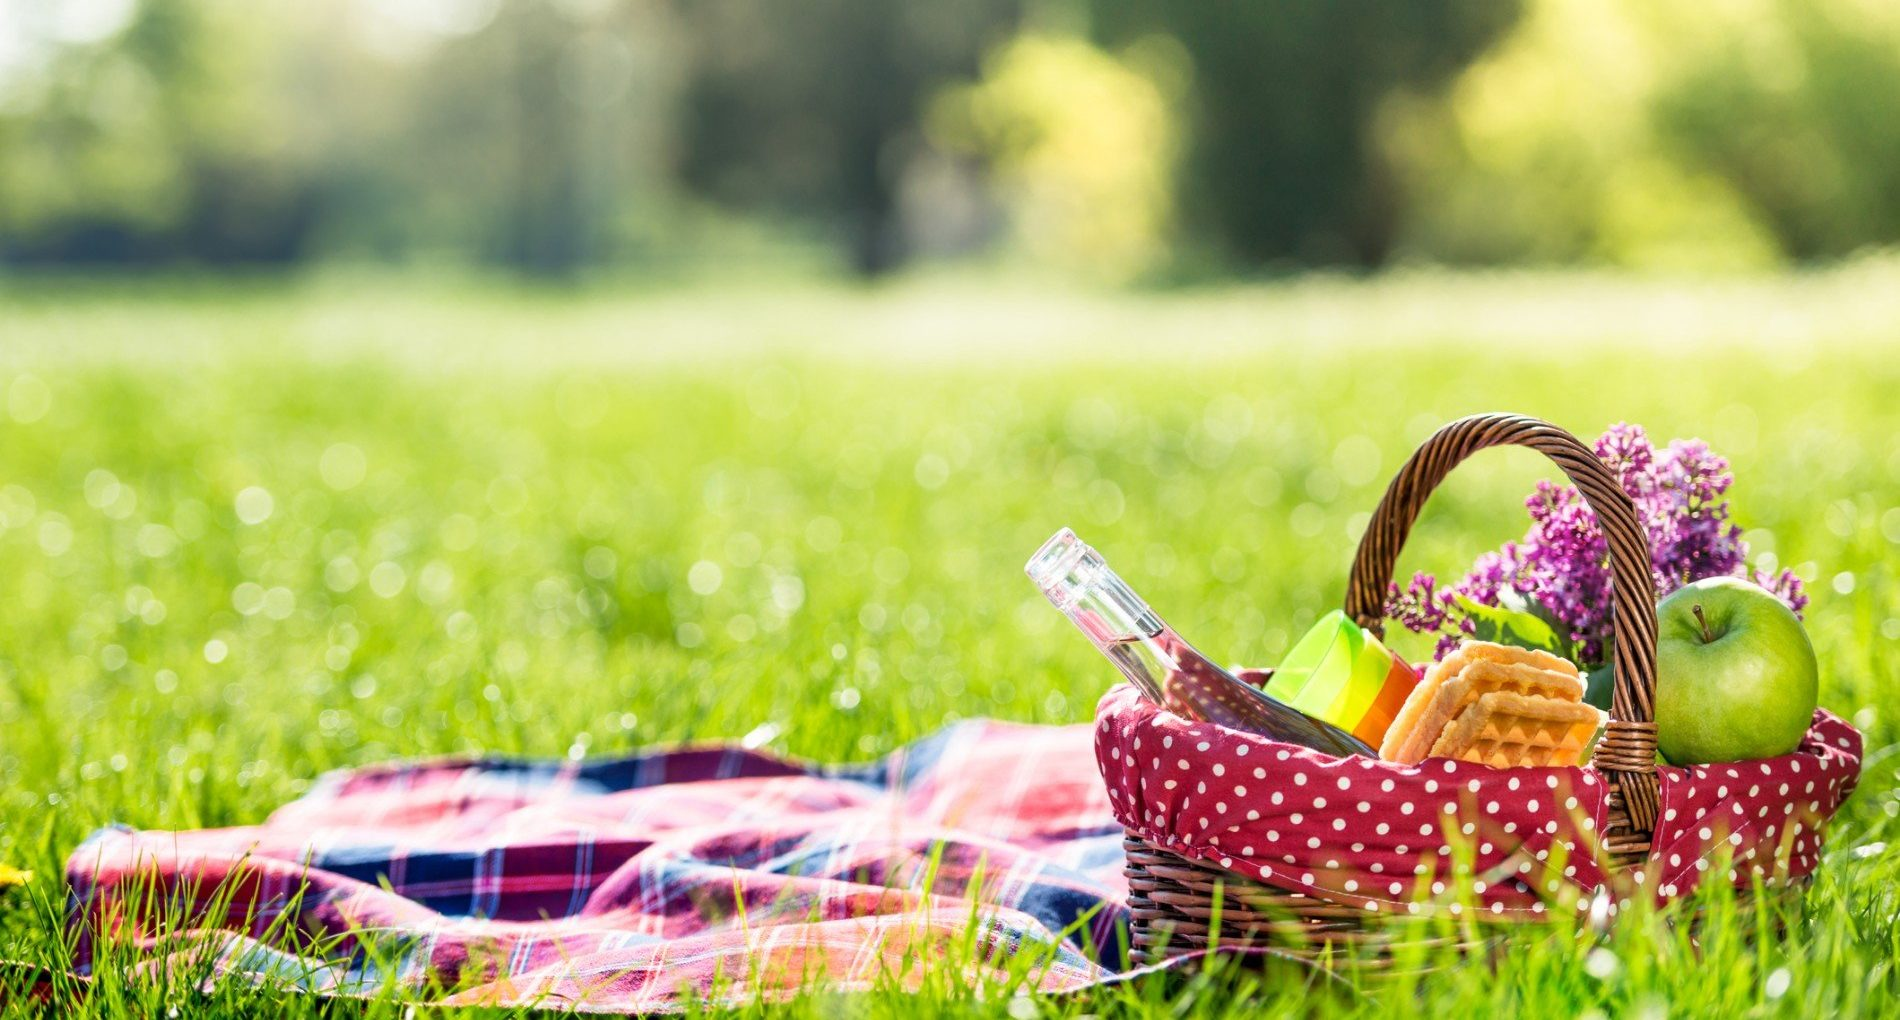 Barrie Summer Events & Activities for 2018 (june)